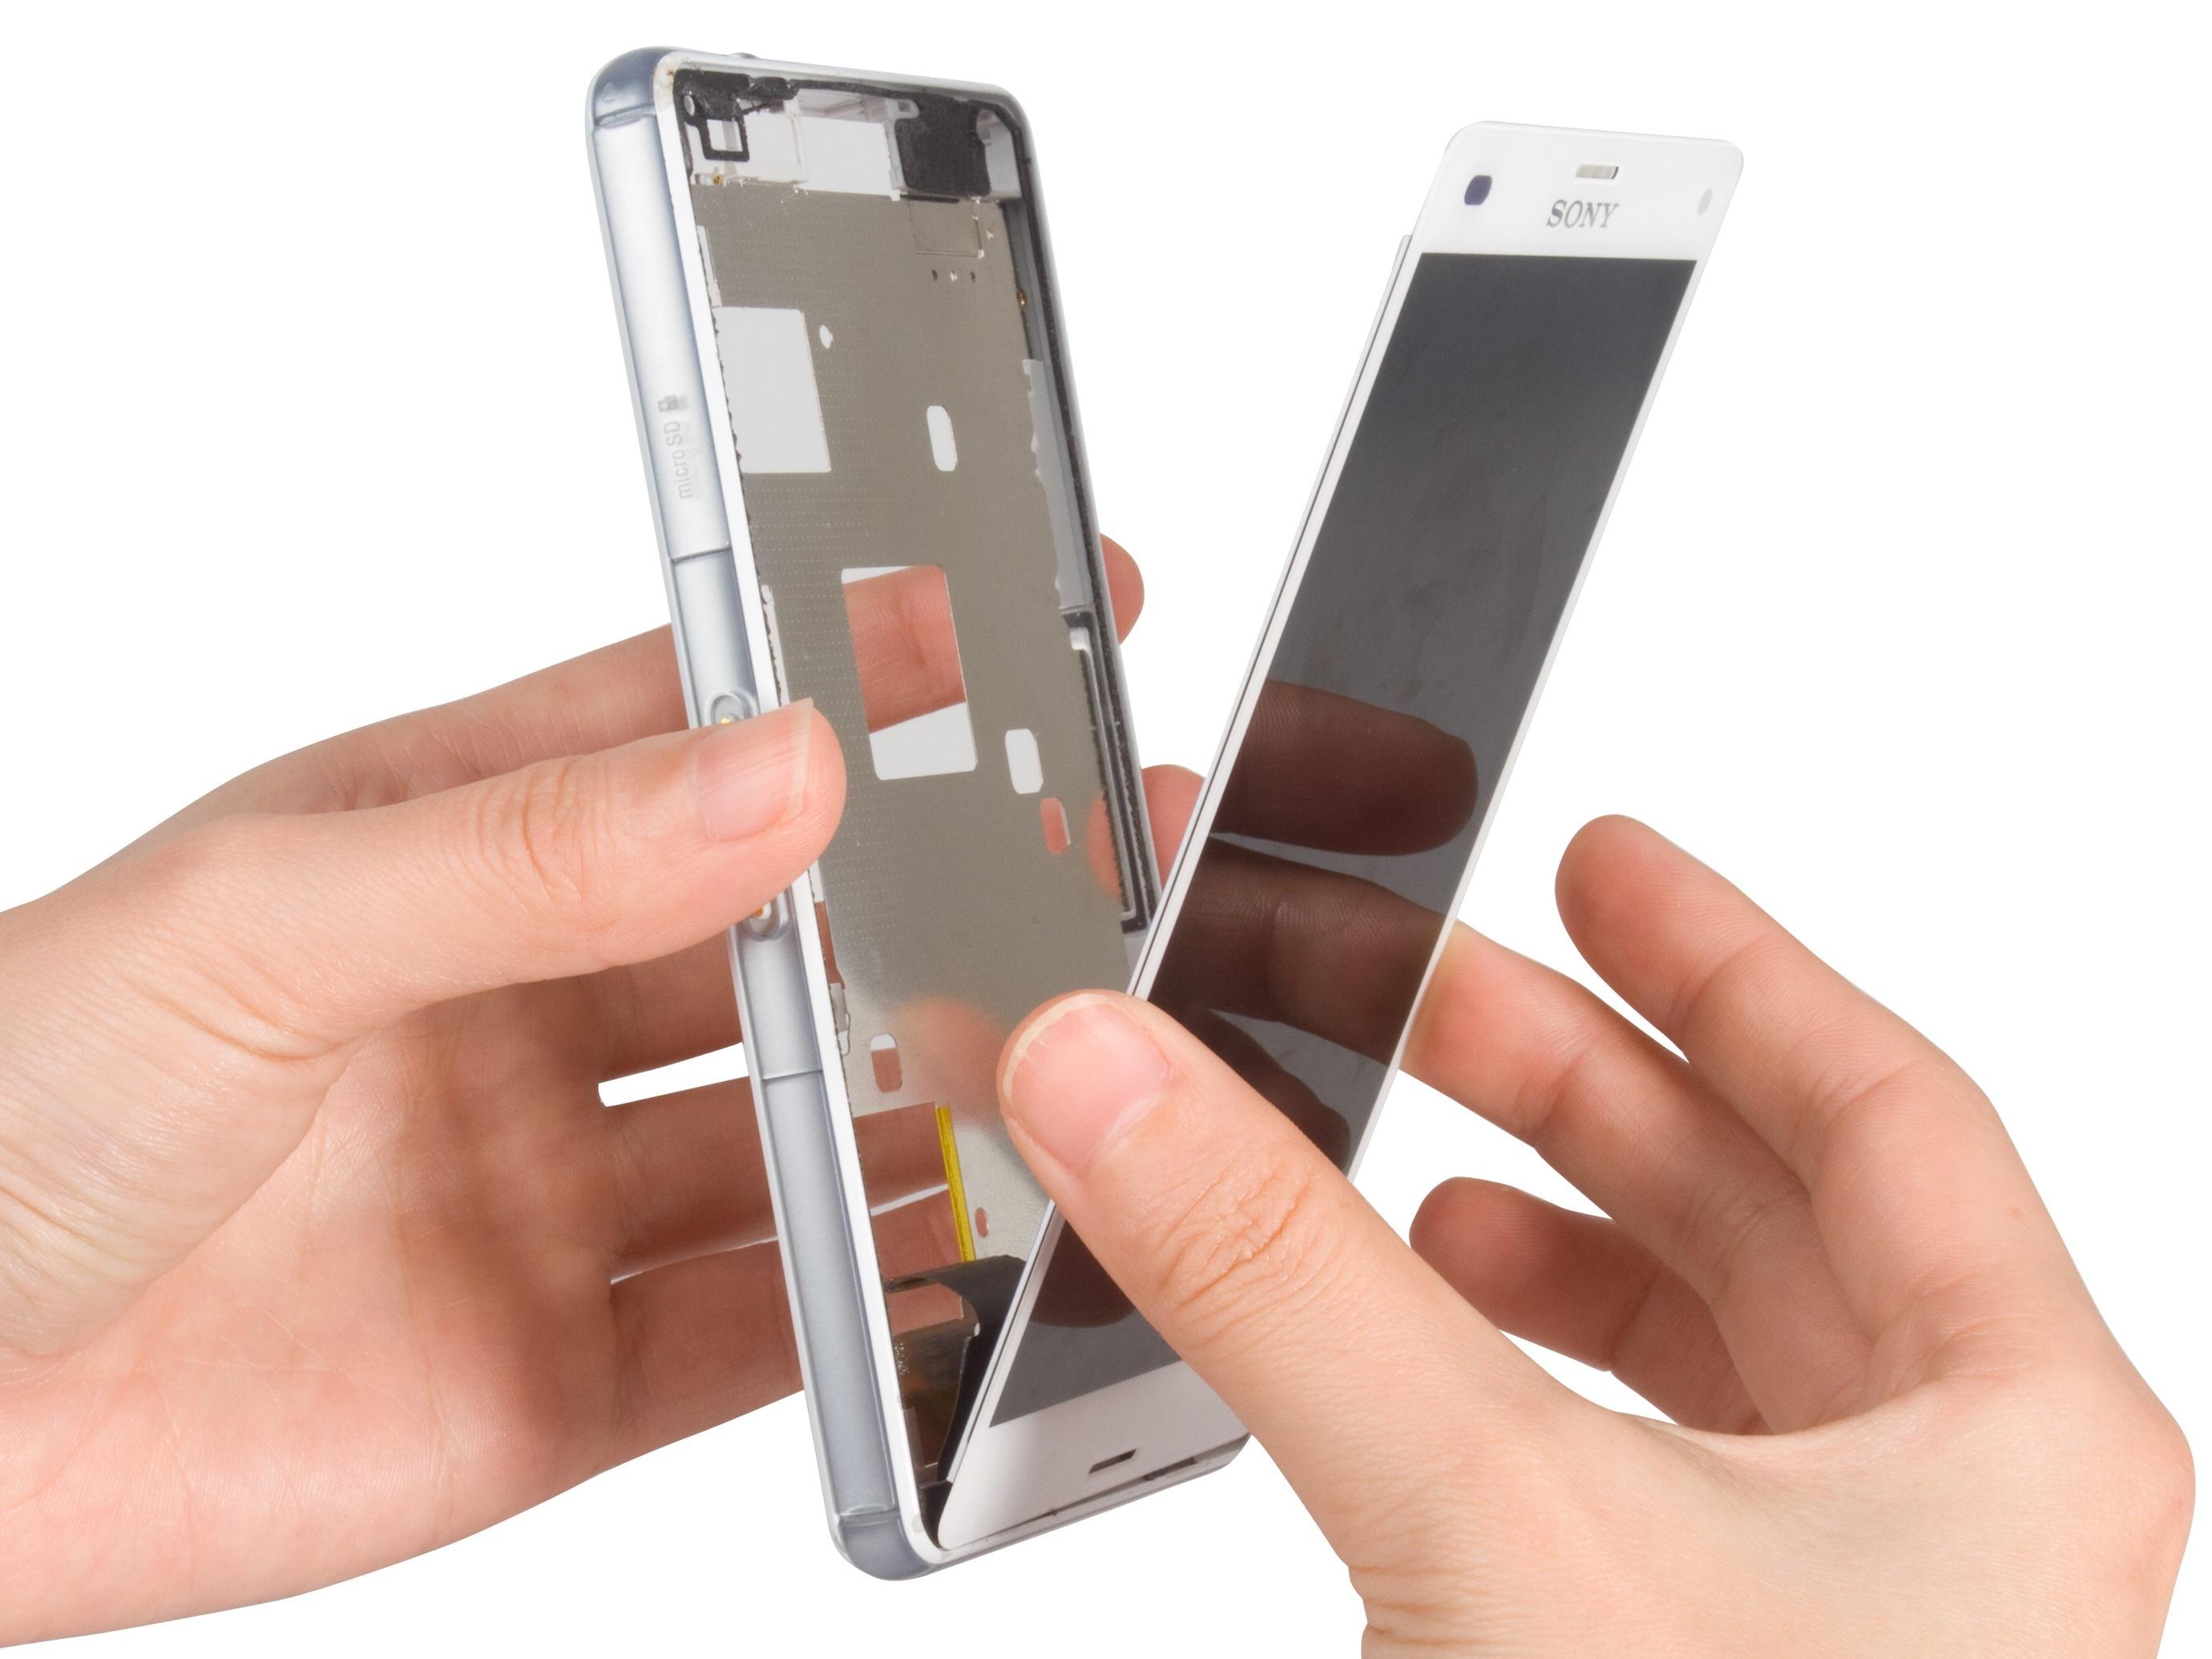 sony xperia z3 compact. Sony Xperia Z3 Compact